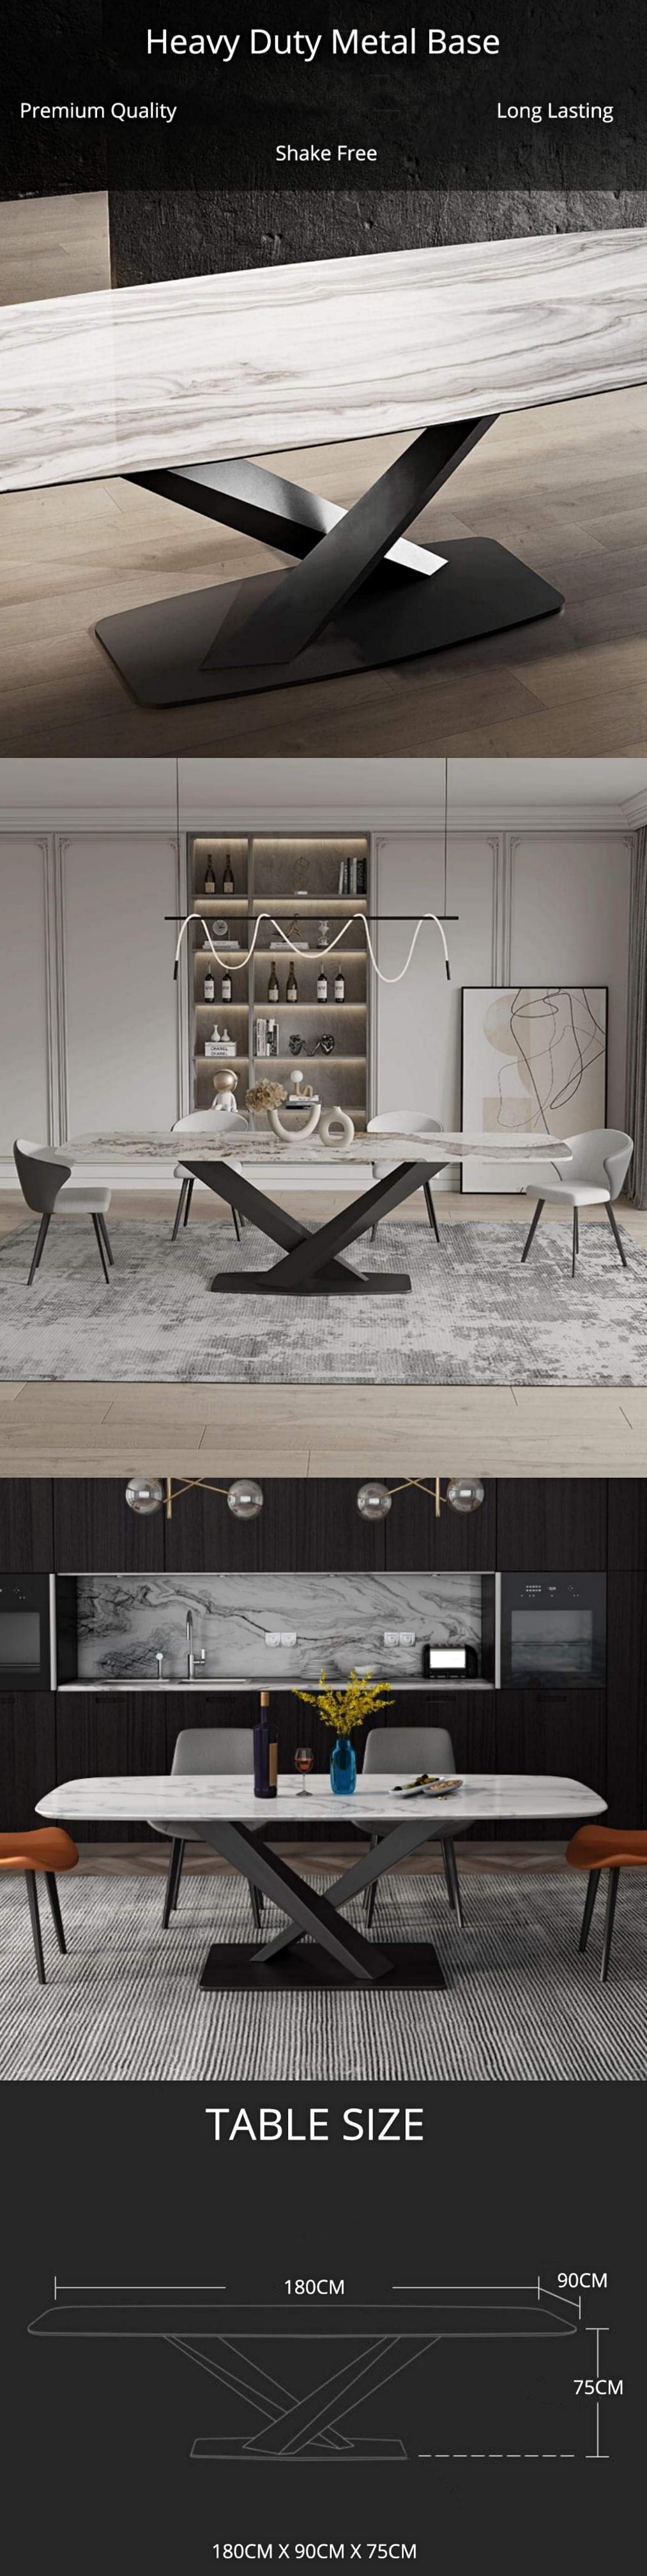 Rectangular-V-Base-Dining-Table-Item-Description-3